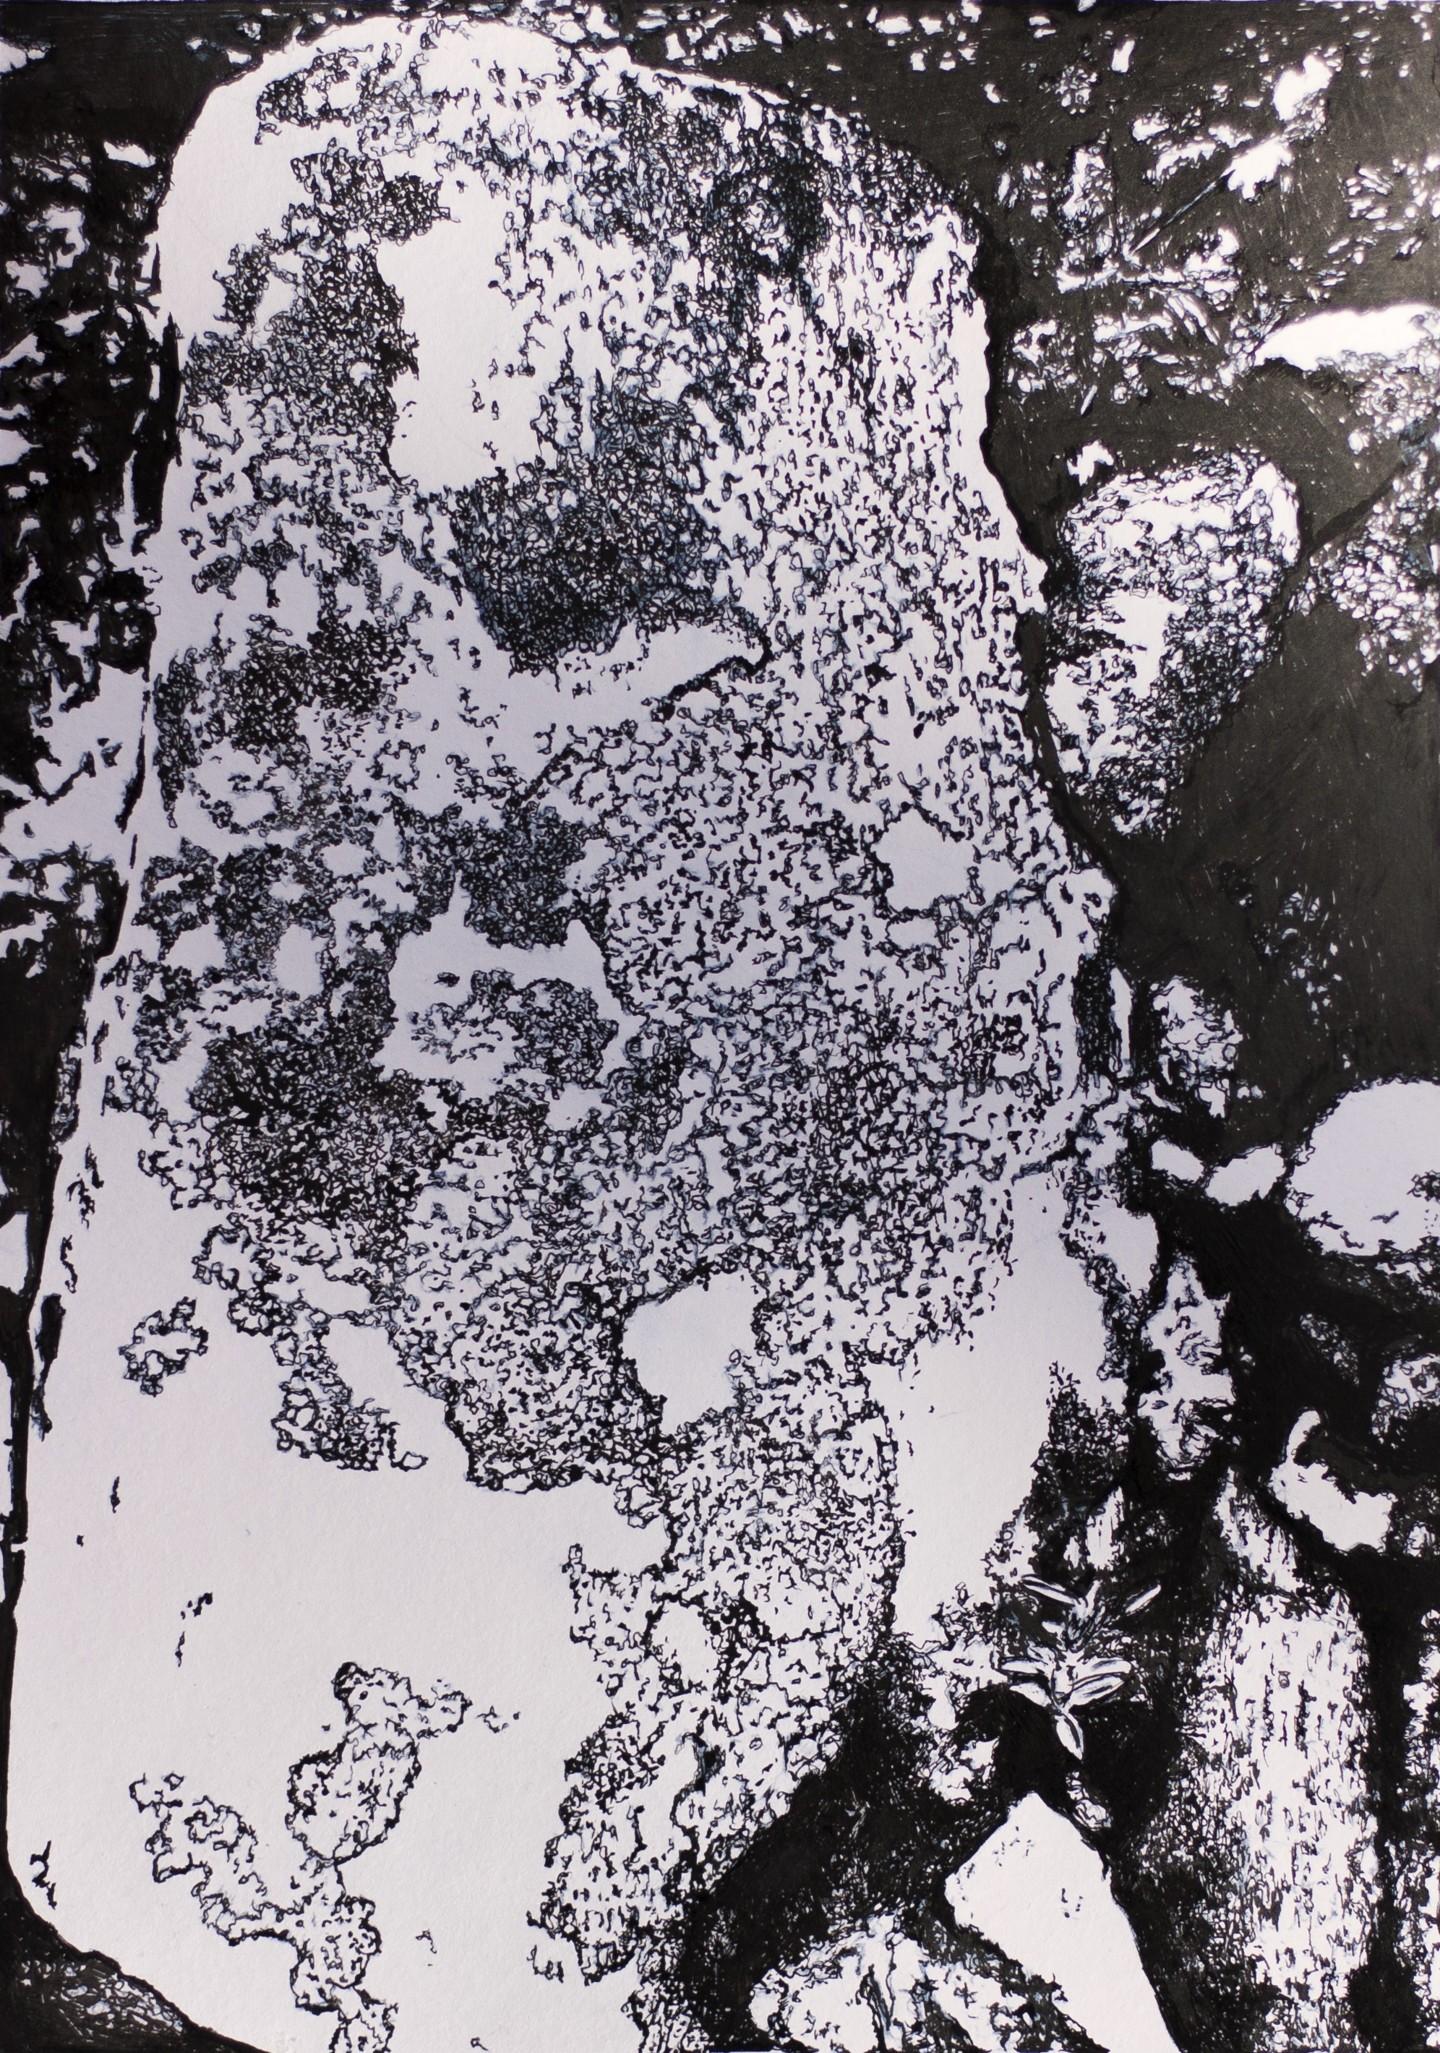 Przemek Kret - Arctic lichens study